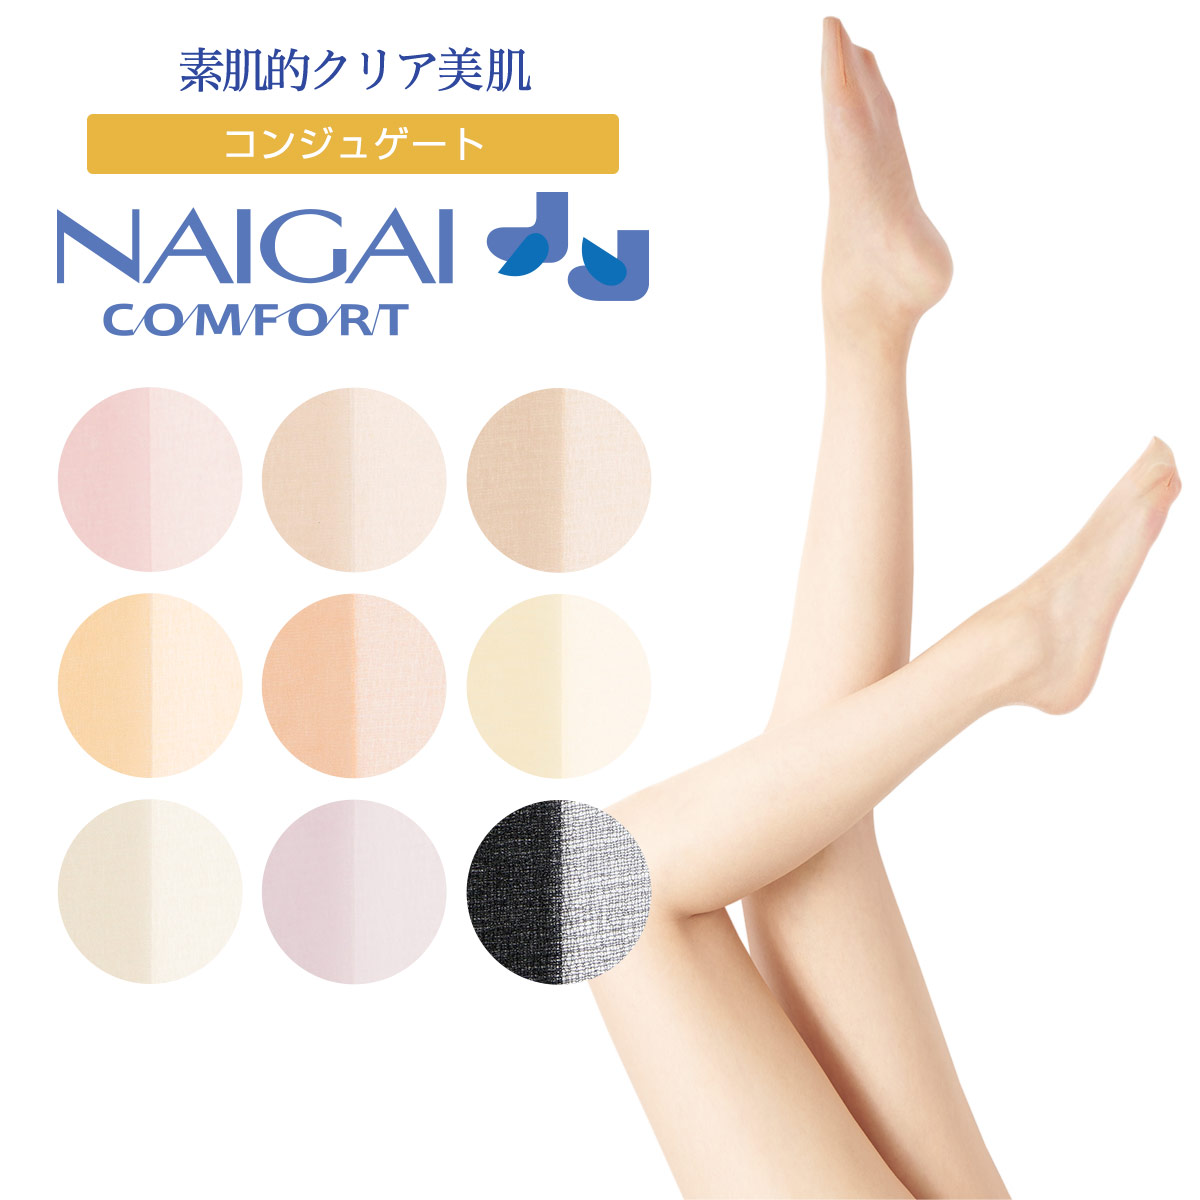 NAIGAI COMFORT 日本製 素肌的クリア美肌 コンジュゲート ウエストゆったりゴム使用 つま先補強 レディース パンティ ストッキング